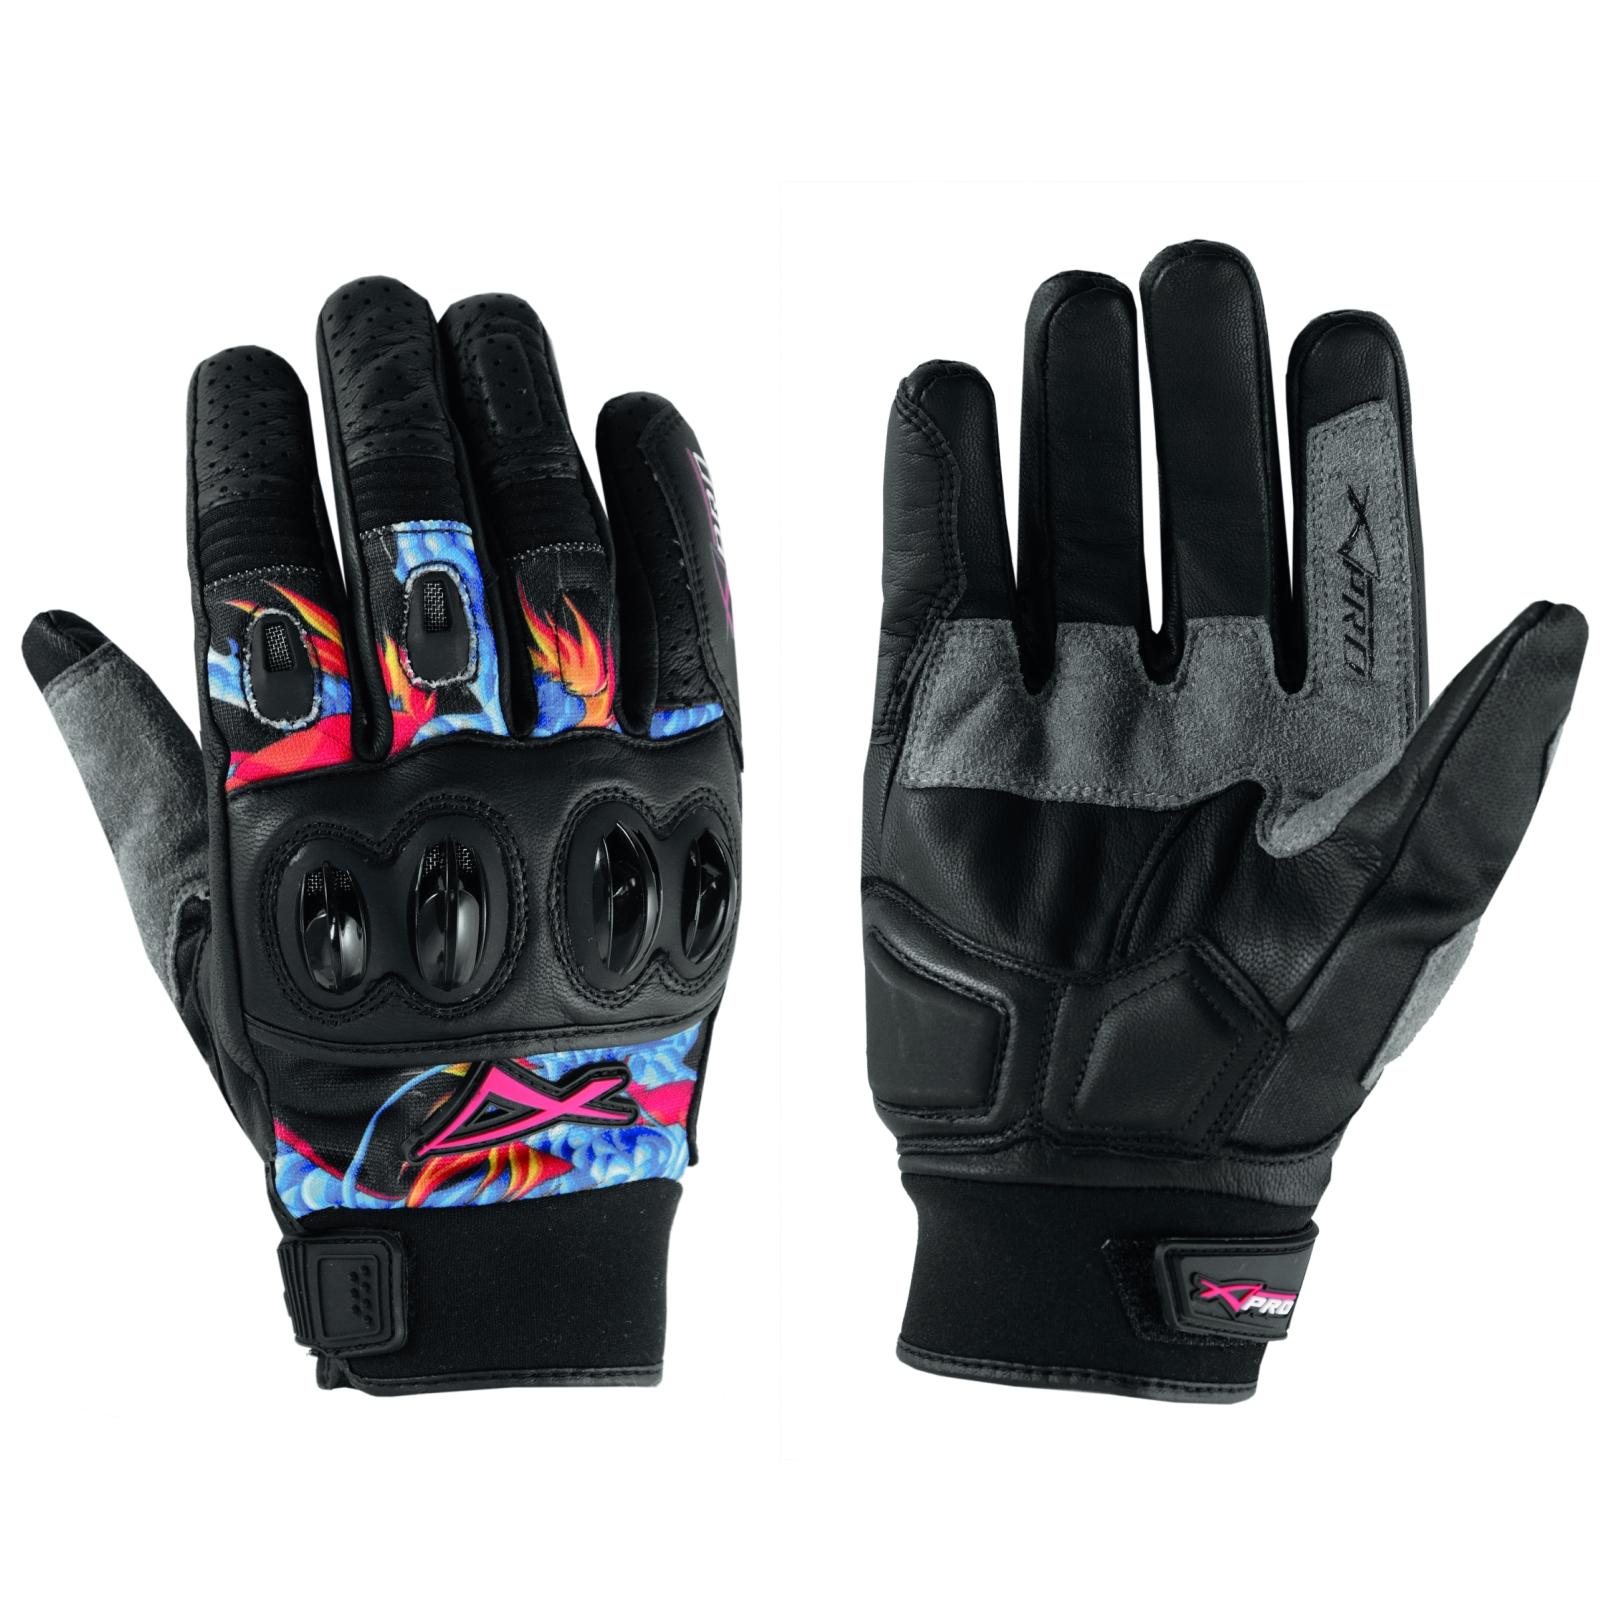 Guantes-Piel-tela-transpirable-Tecnico-Summer-Moto-Honda-Kawasaki-Yamaha